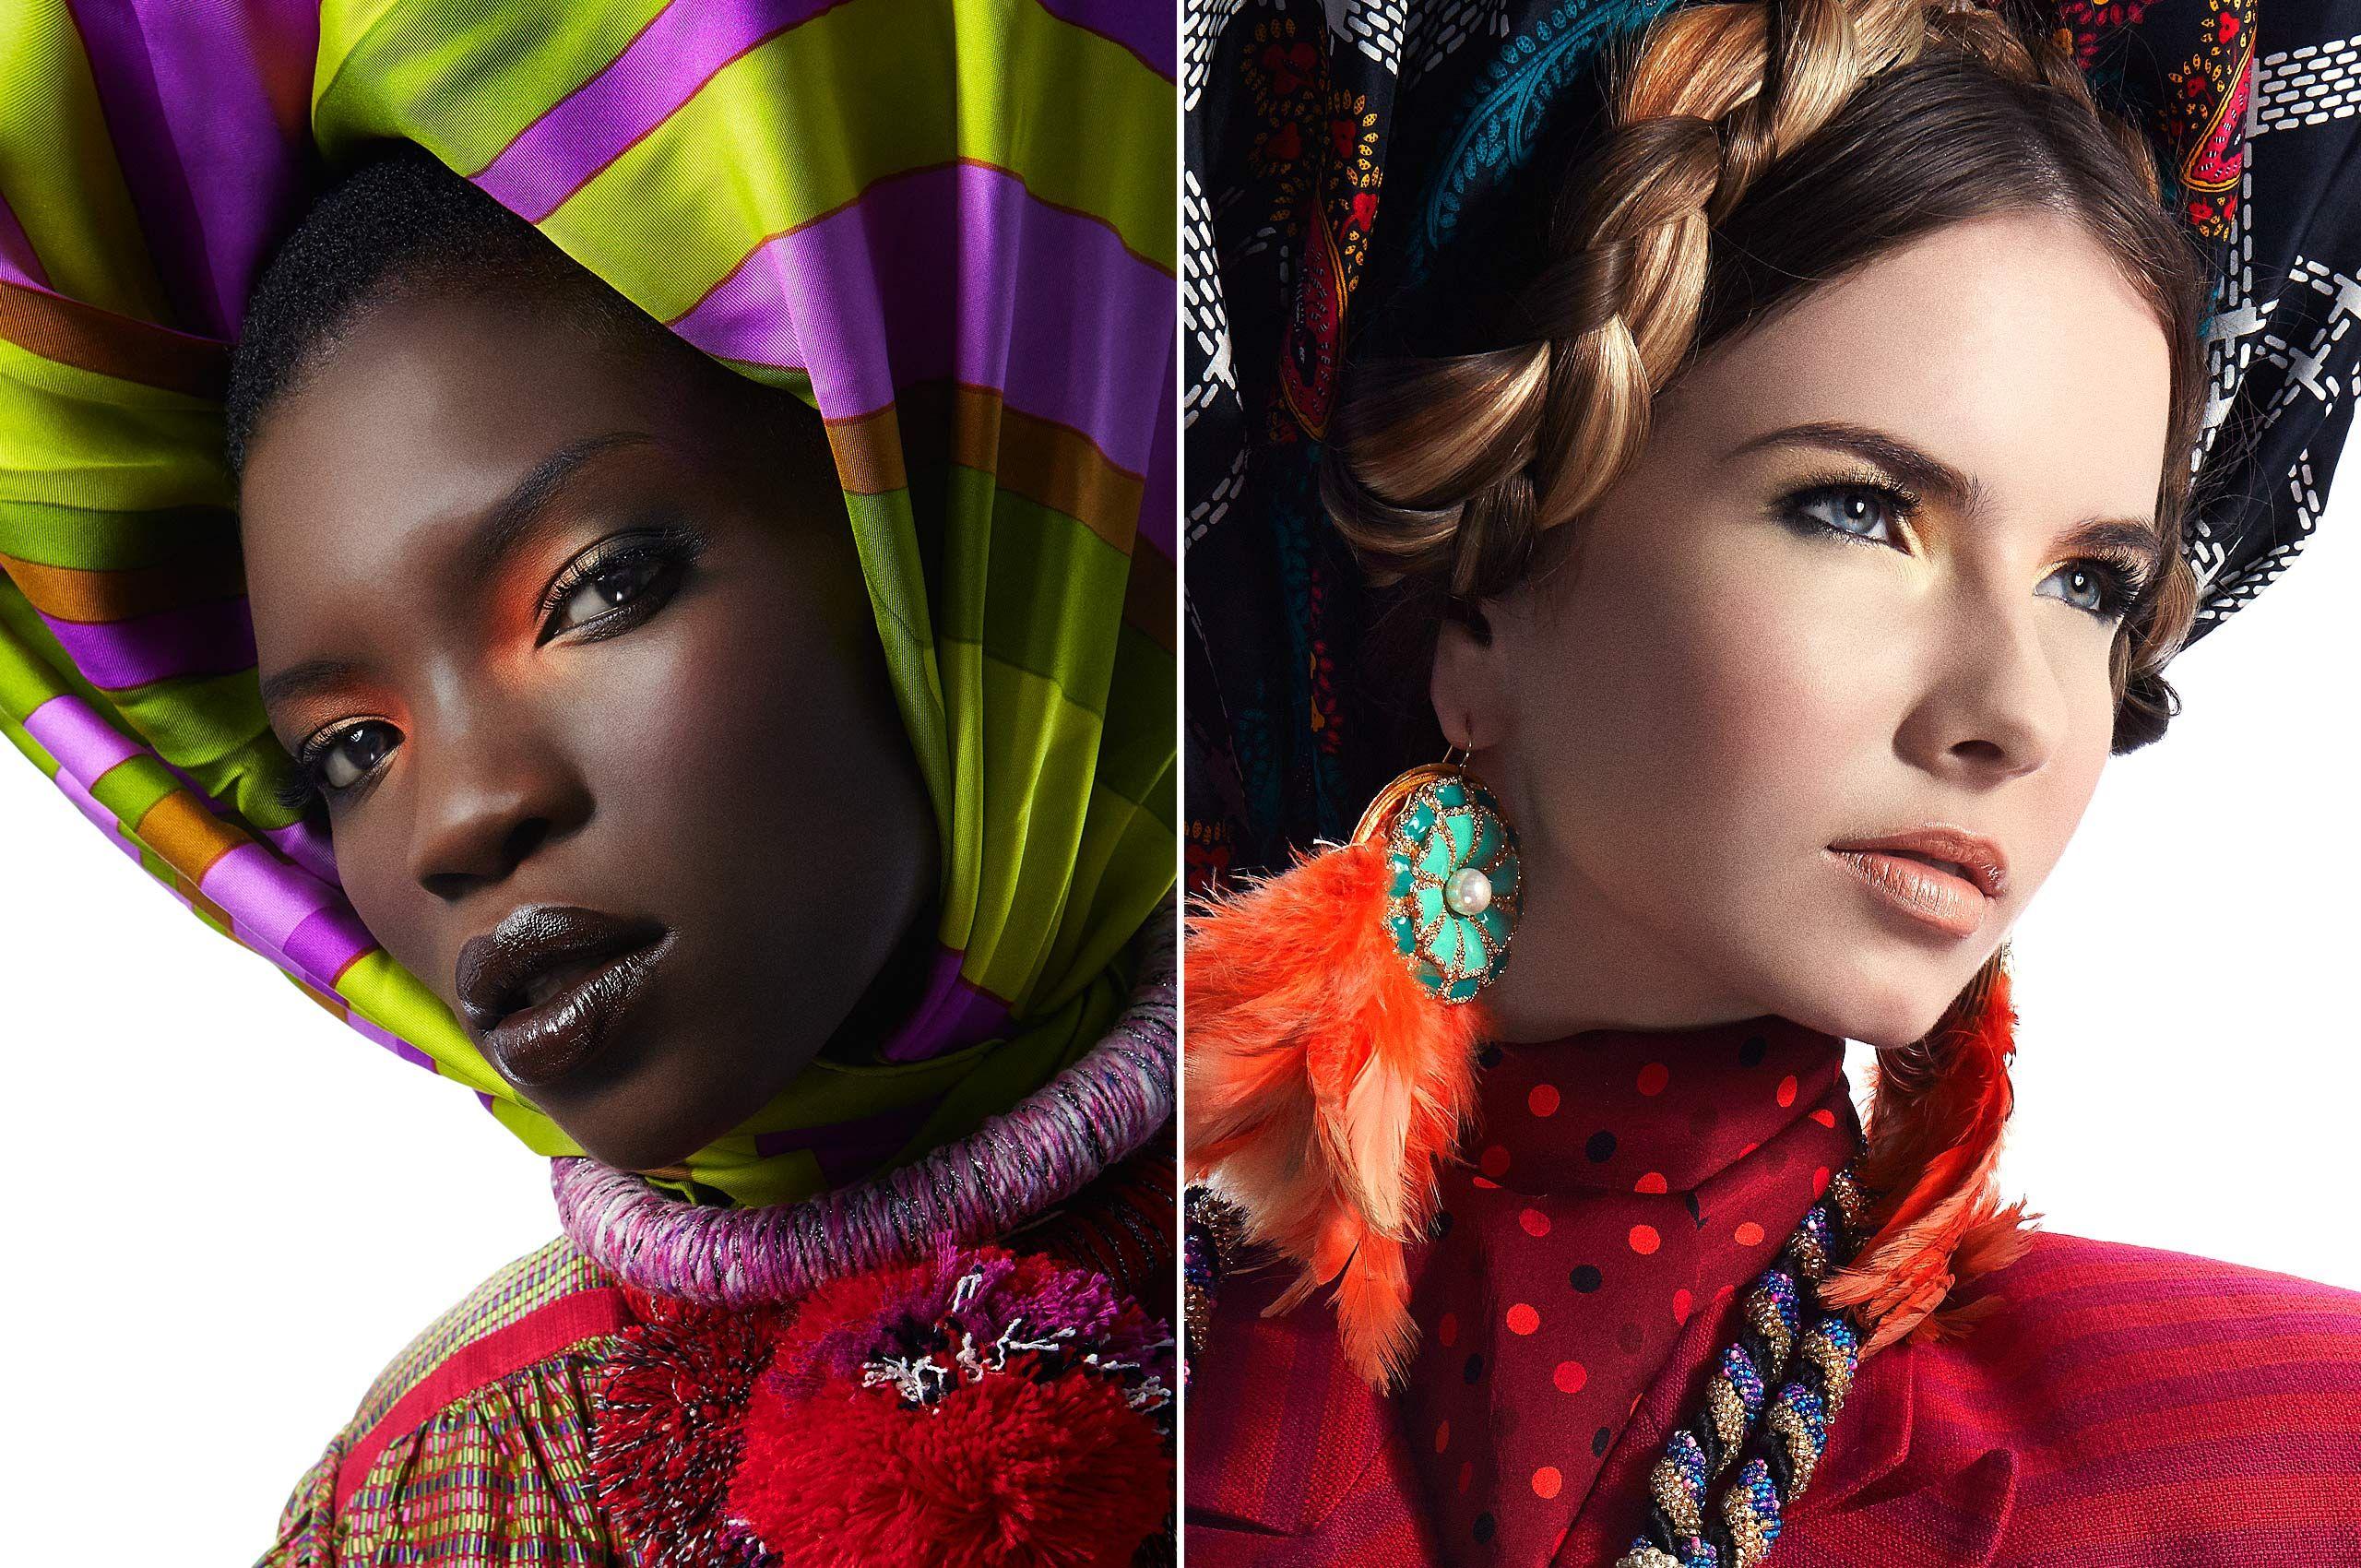 Beauty_Tantalum_Cover_Horizontal_002.jpg